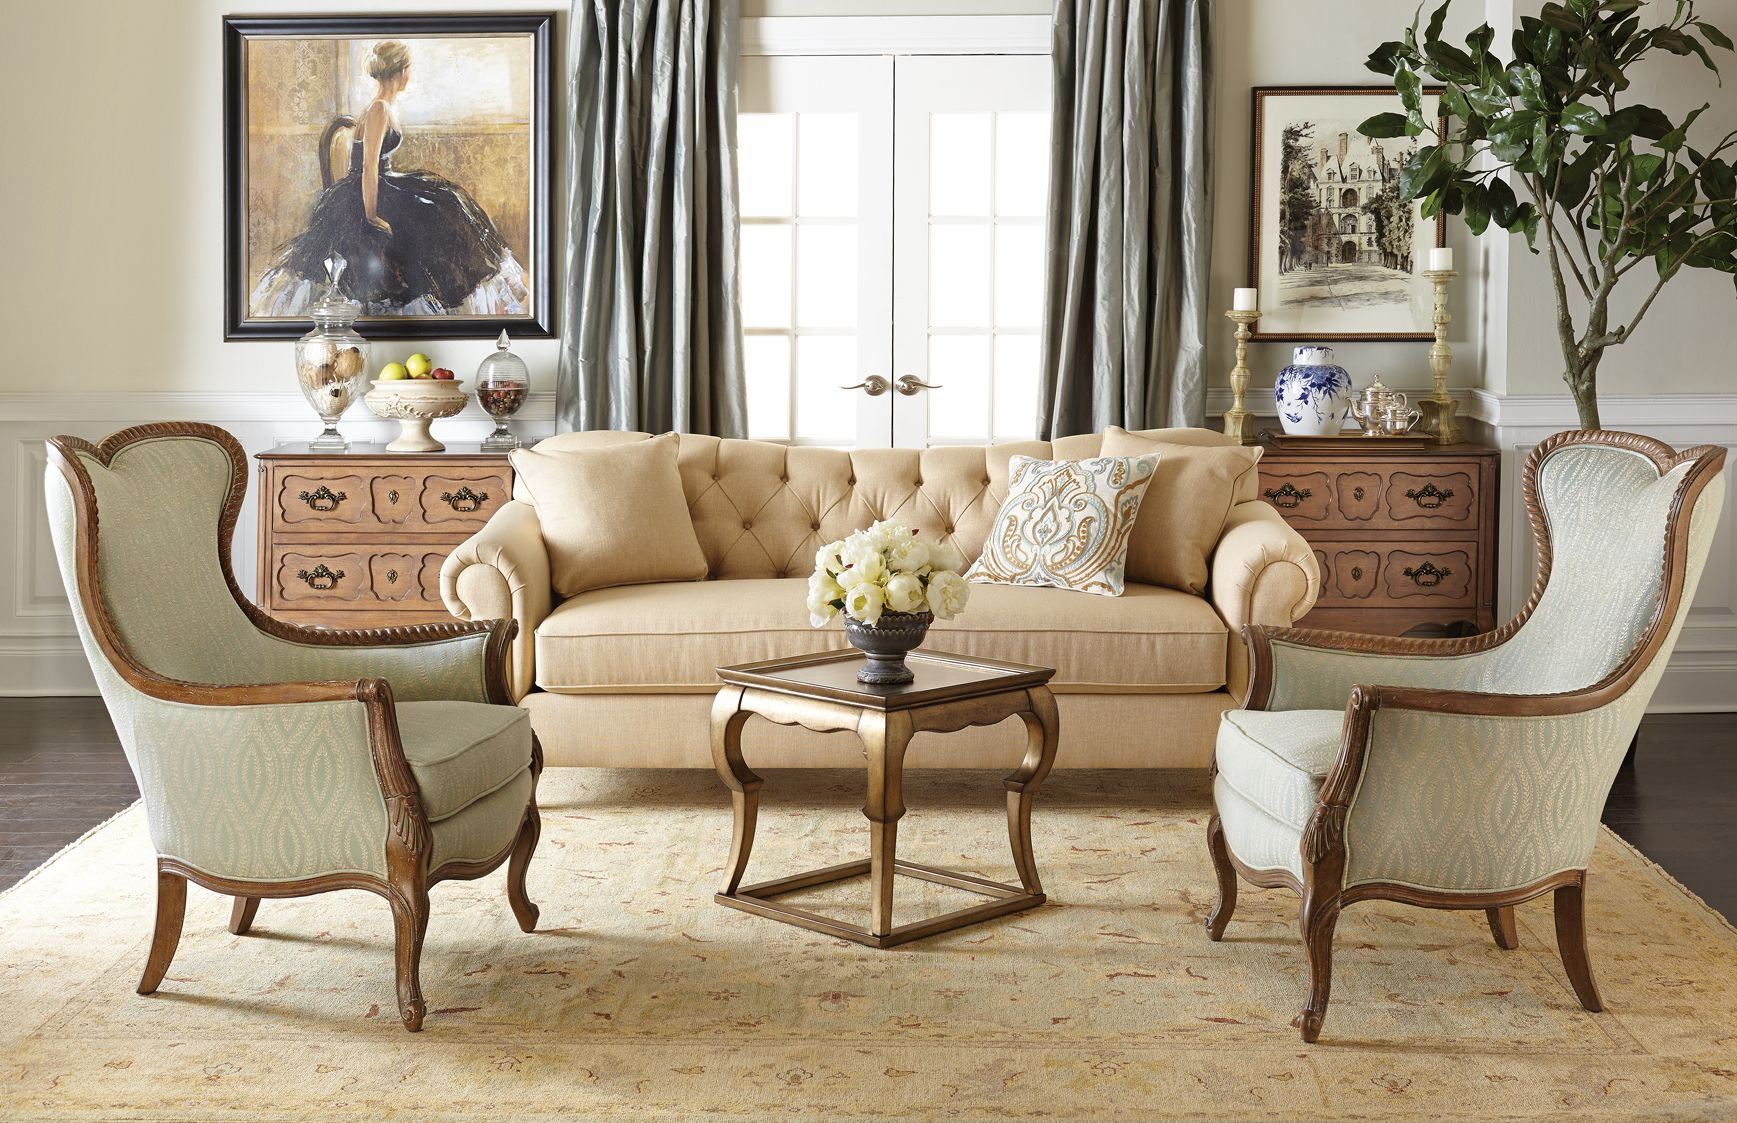 star sofa mumbai maharashtra natalia leather and chenille clarendon bombay canada livingroom furniture